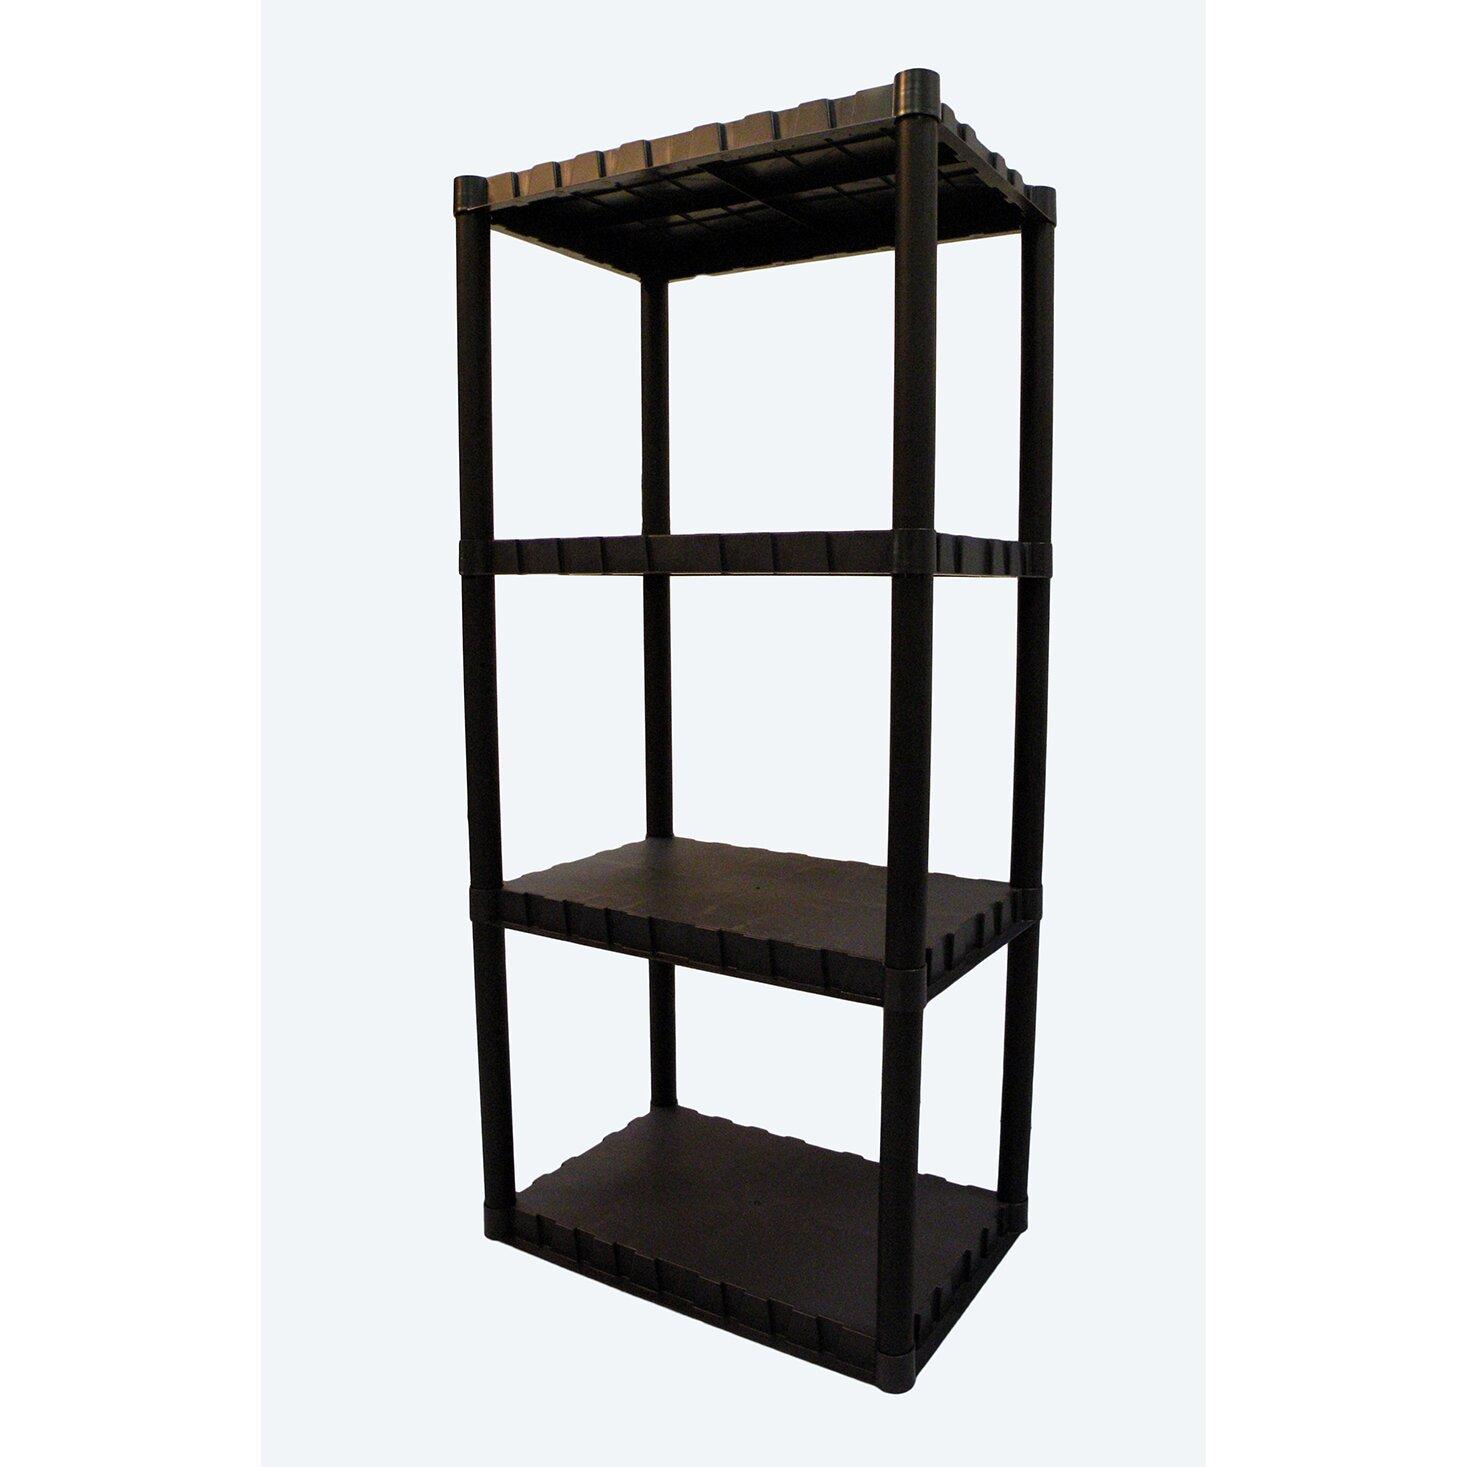 Keter Freestanding Plastic Storage 49 Quot H Four Shelf